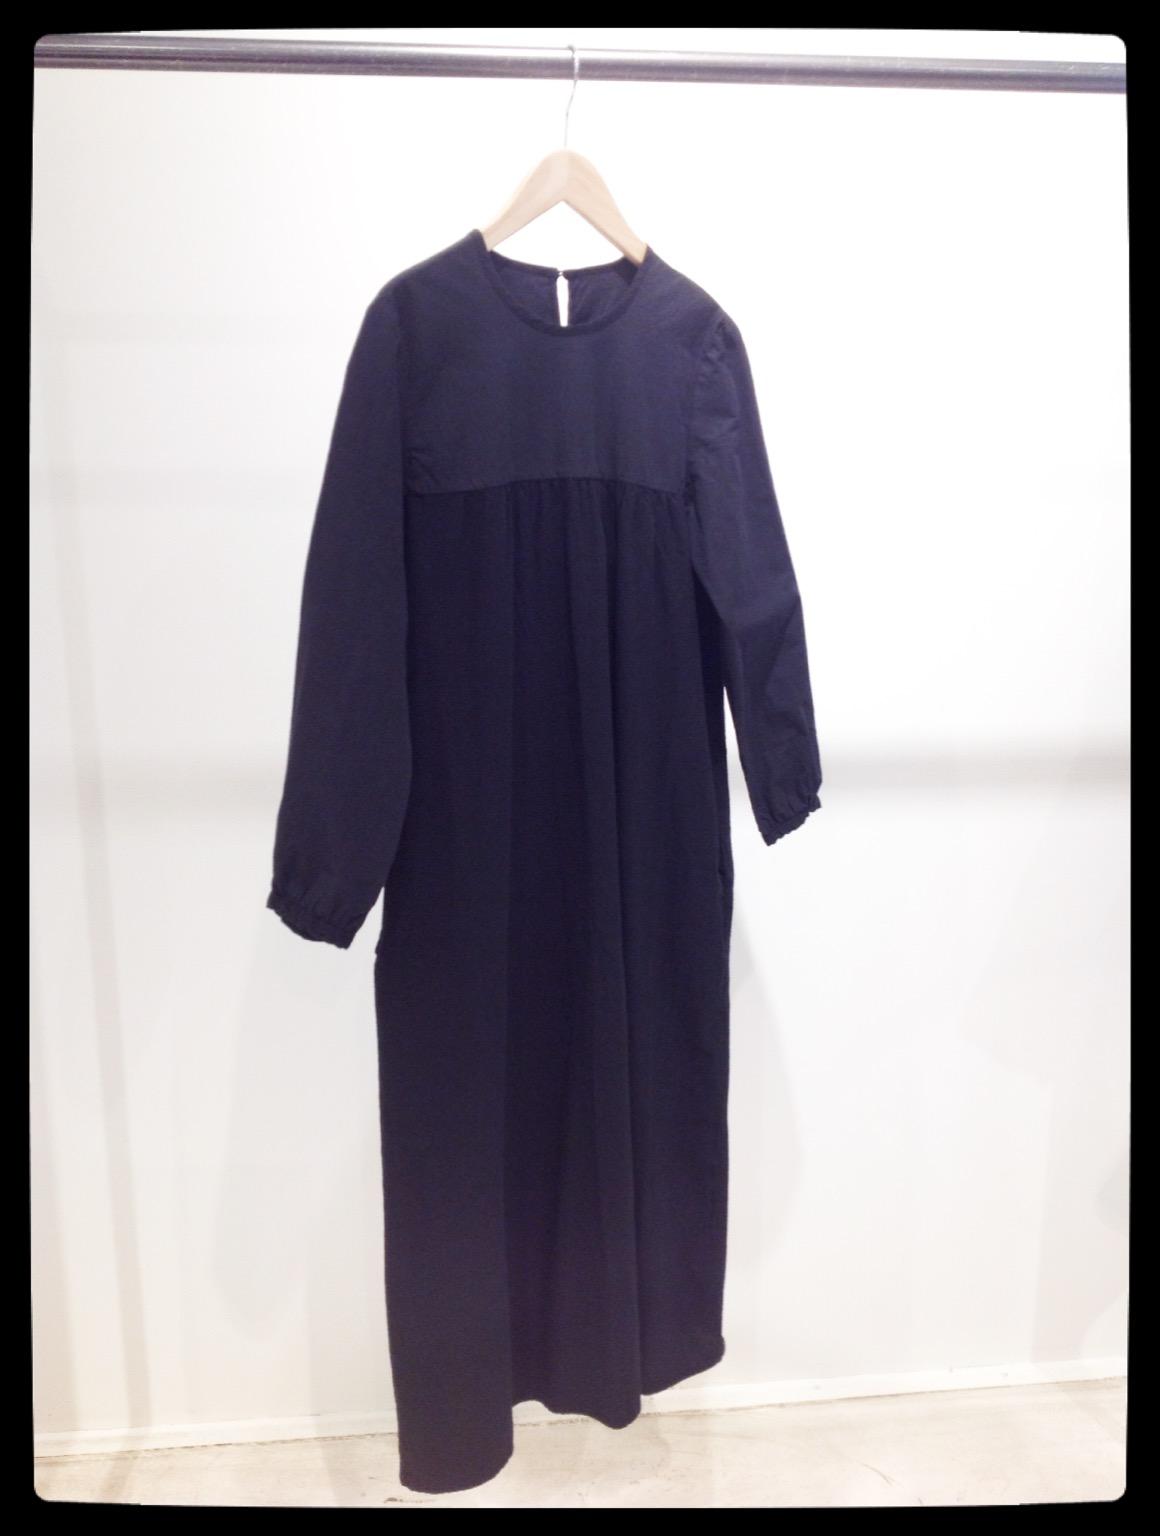 COSMIC WONDER【コズミックワンダー】有機栽培綿のデイドレス▽香川・綾川店